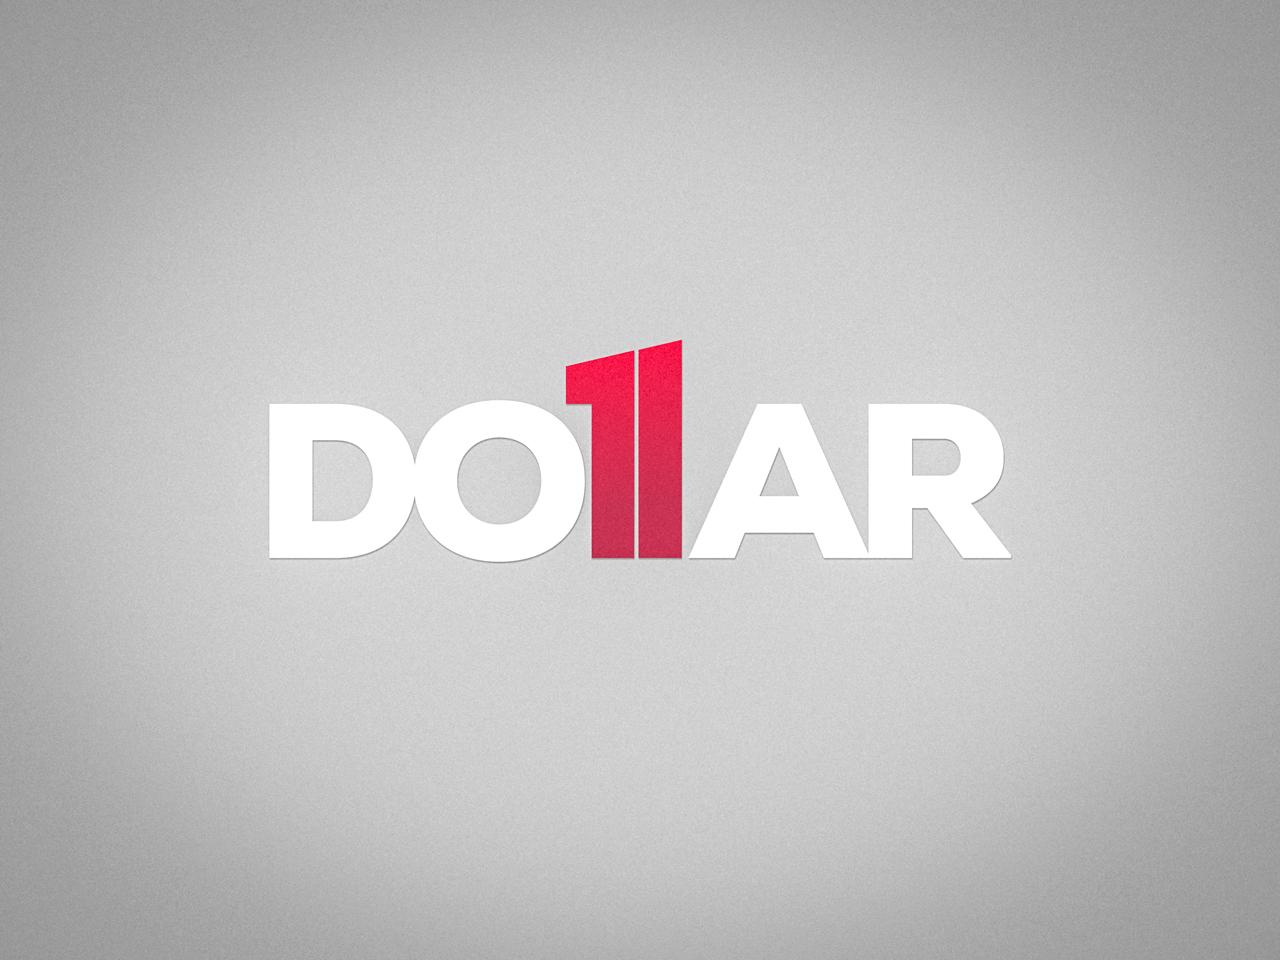 Dollar1 logo